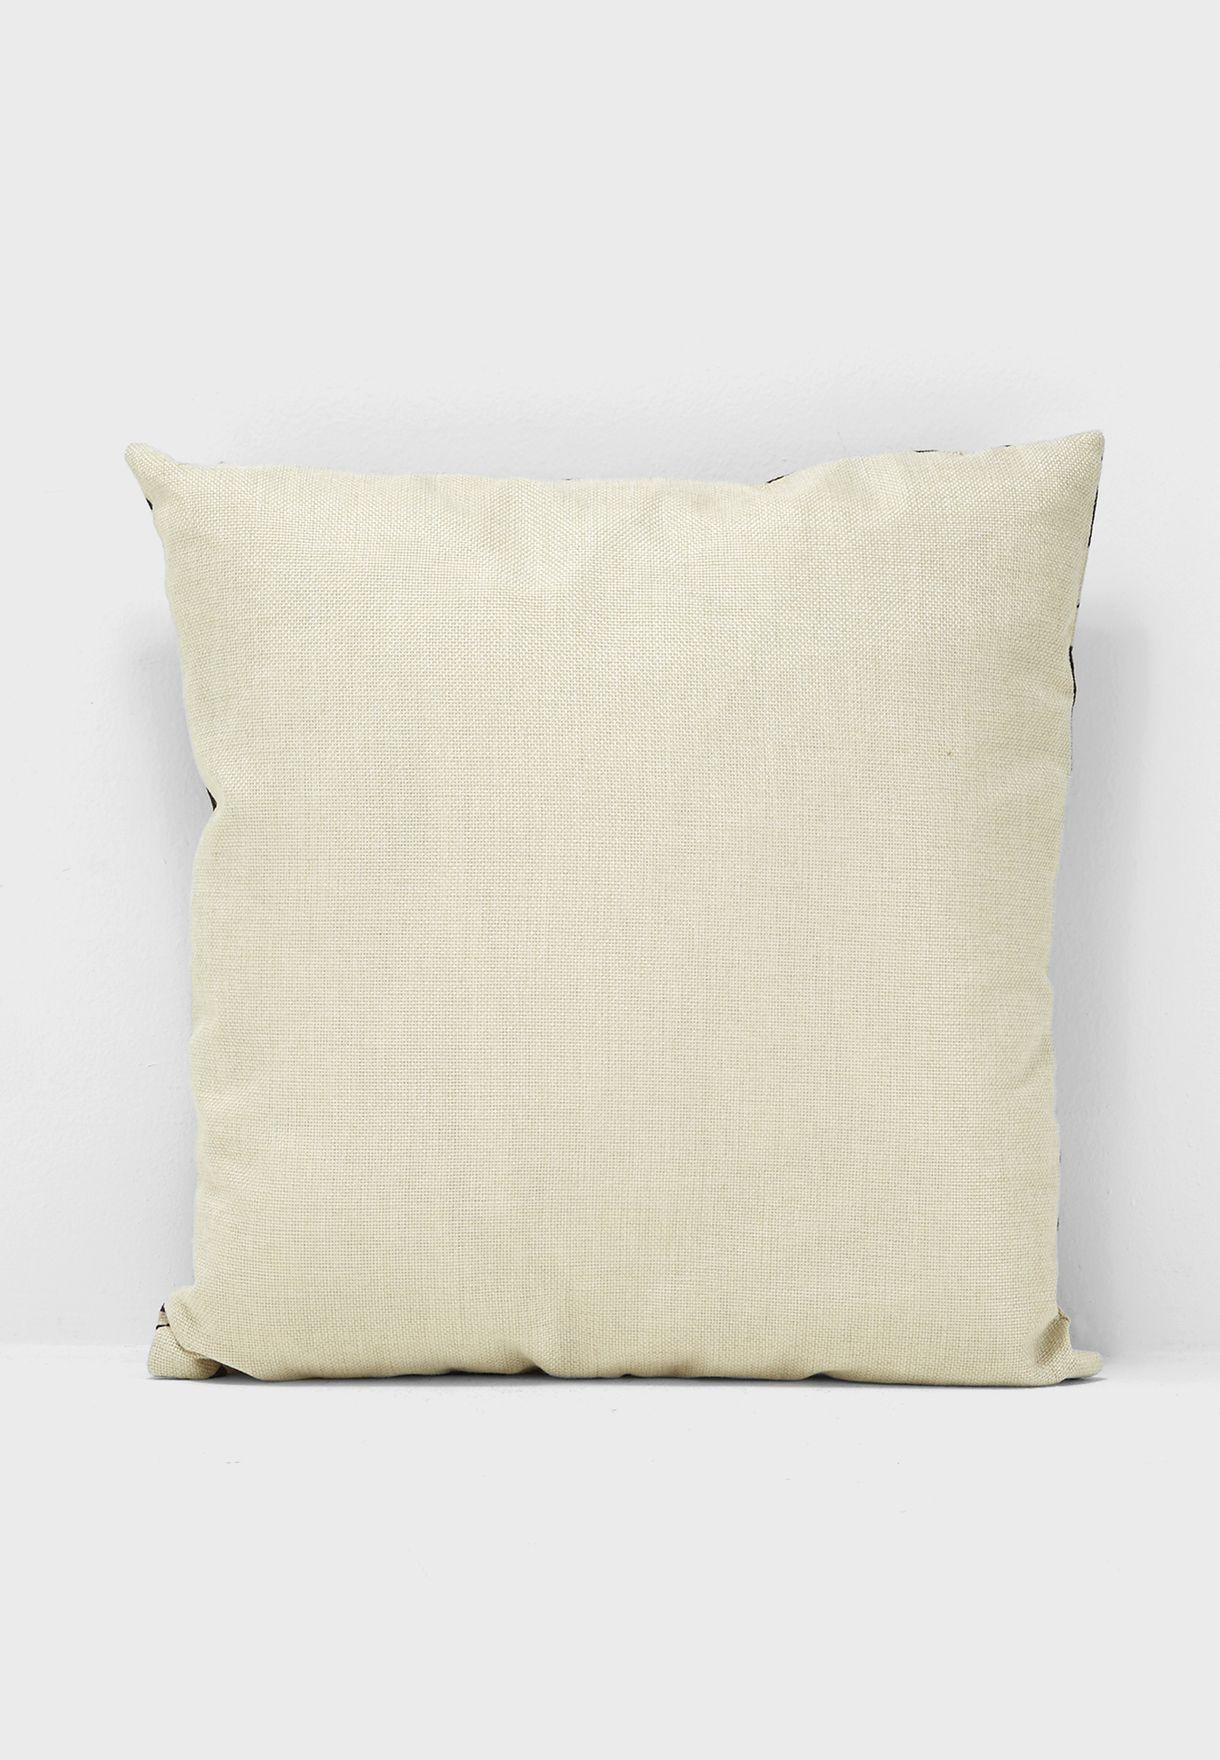 Zig Zag Cushion Insert Included